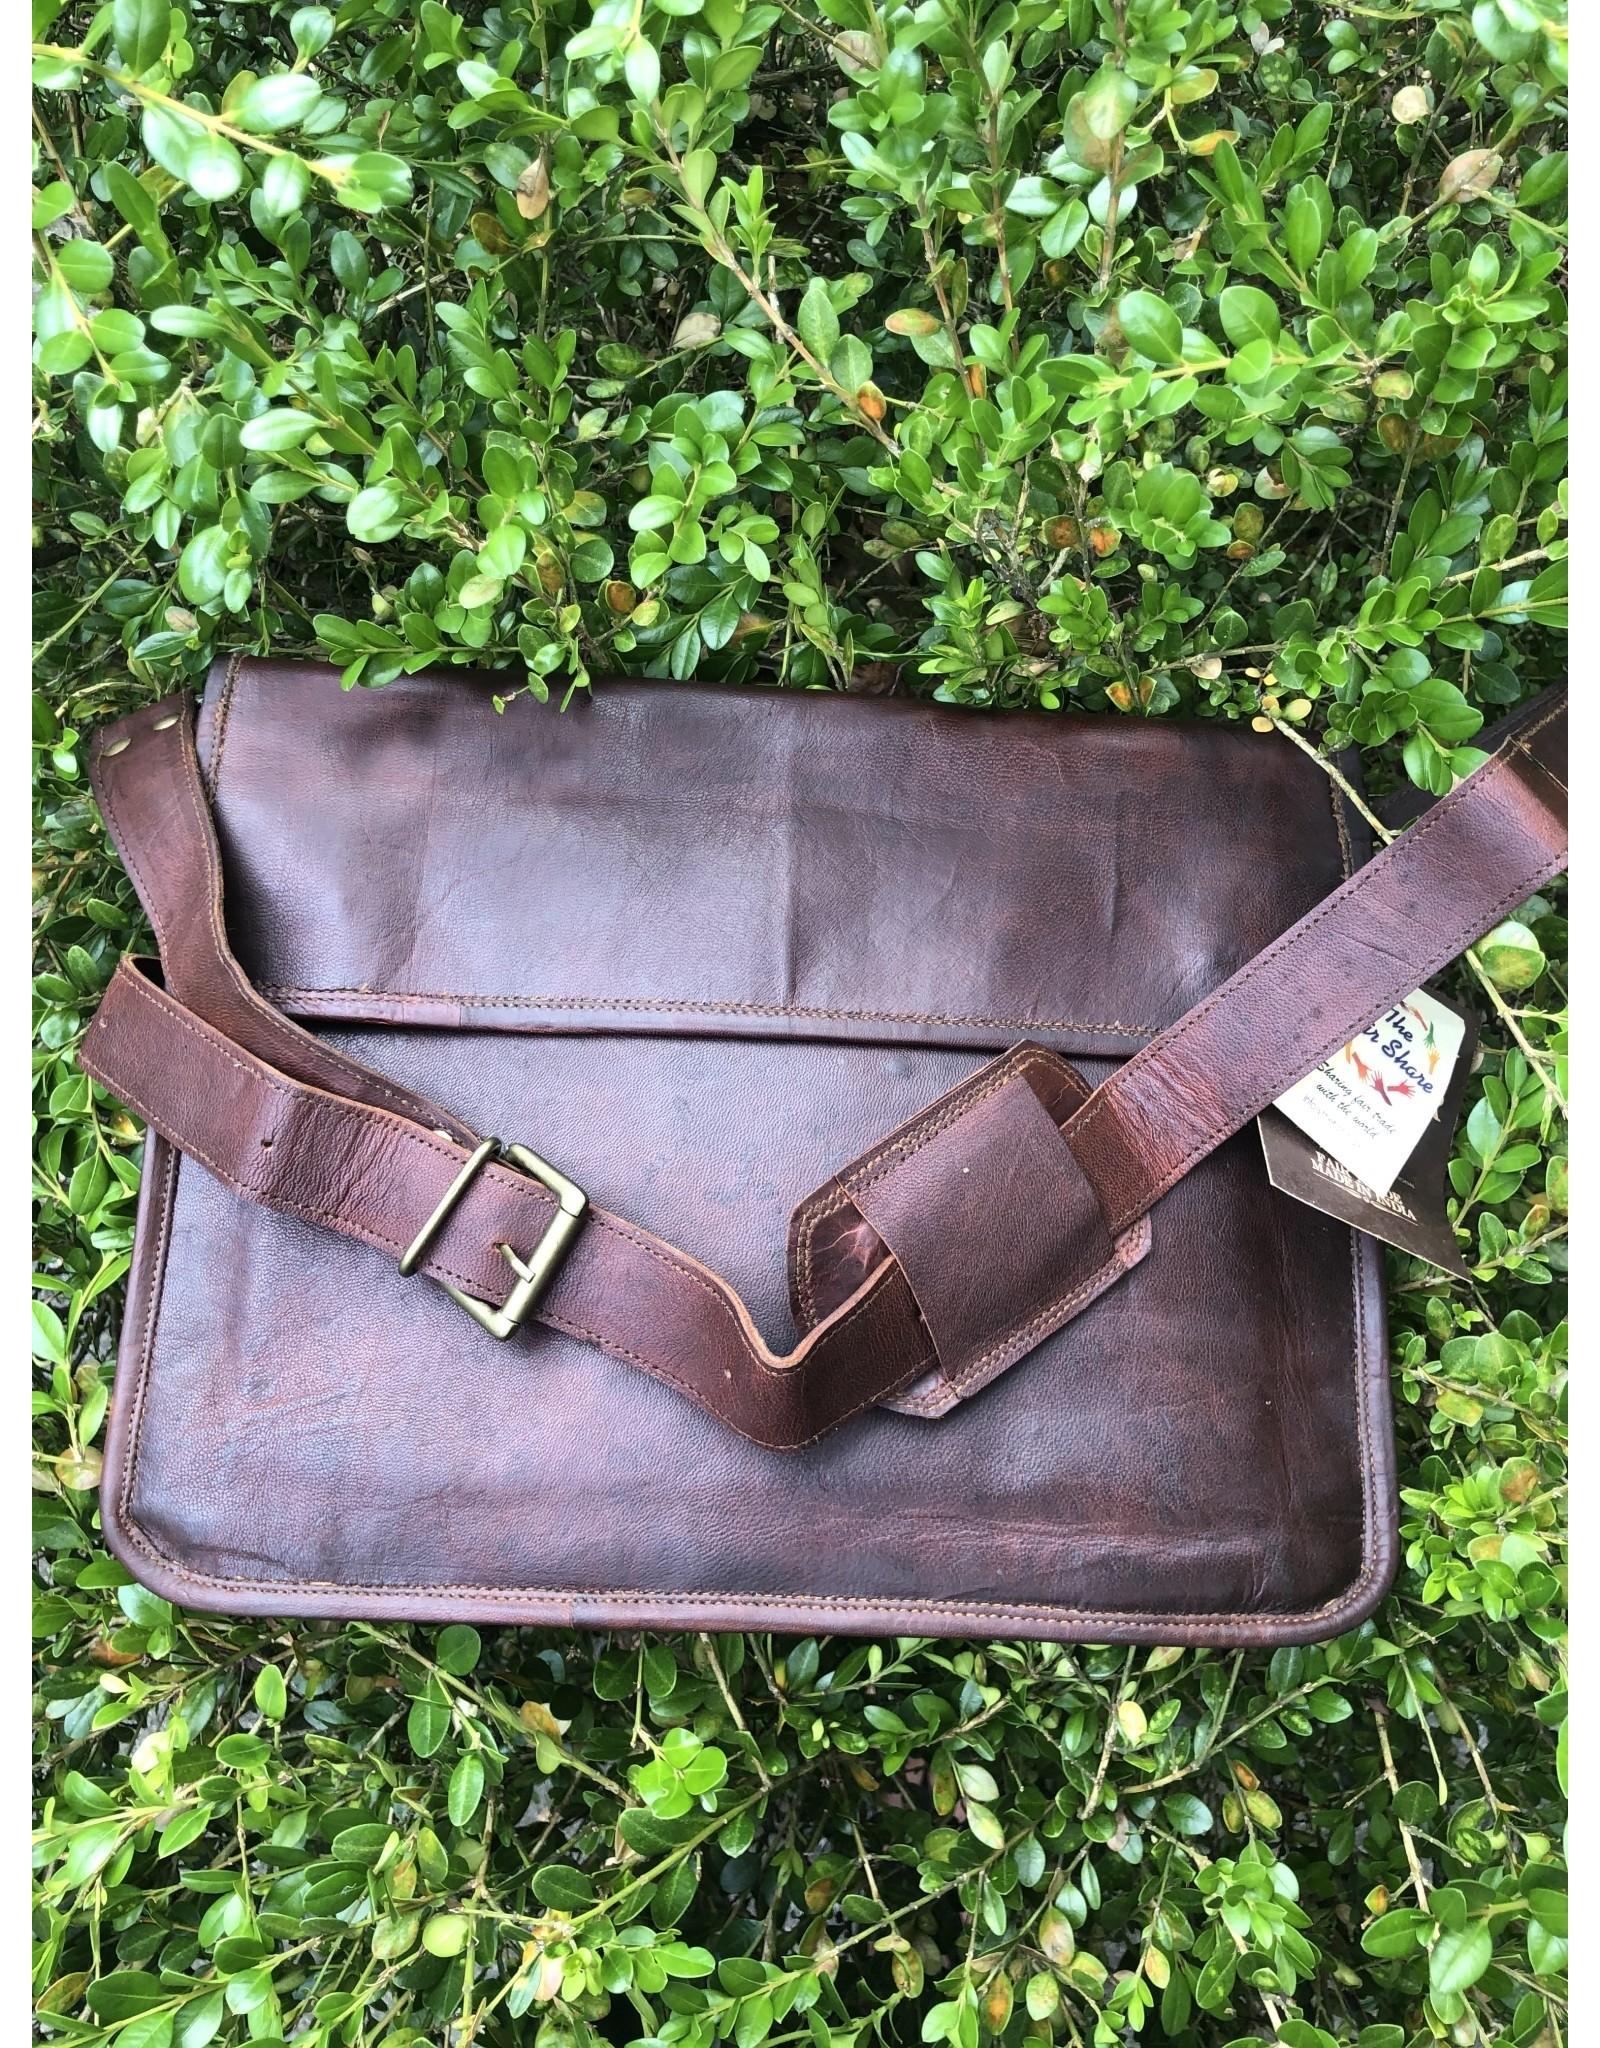 Handmade Fair Trade Leather Bags